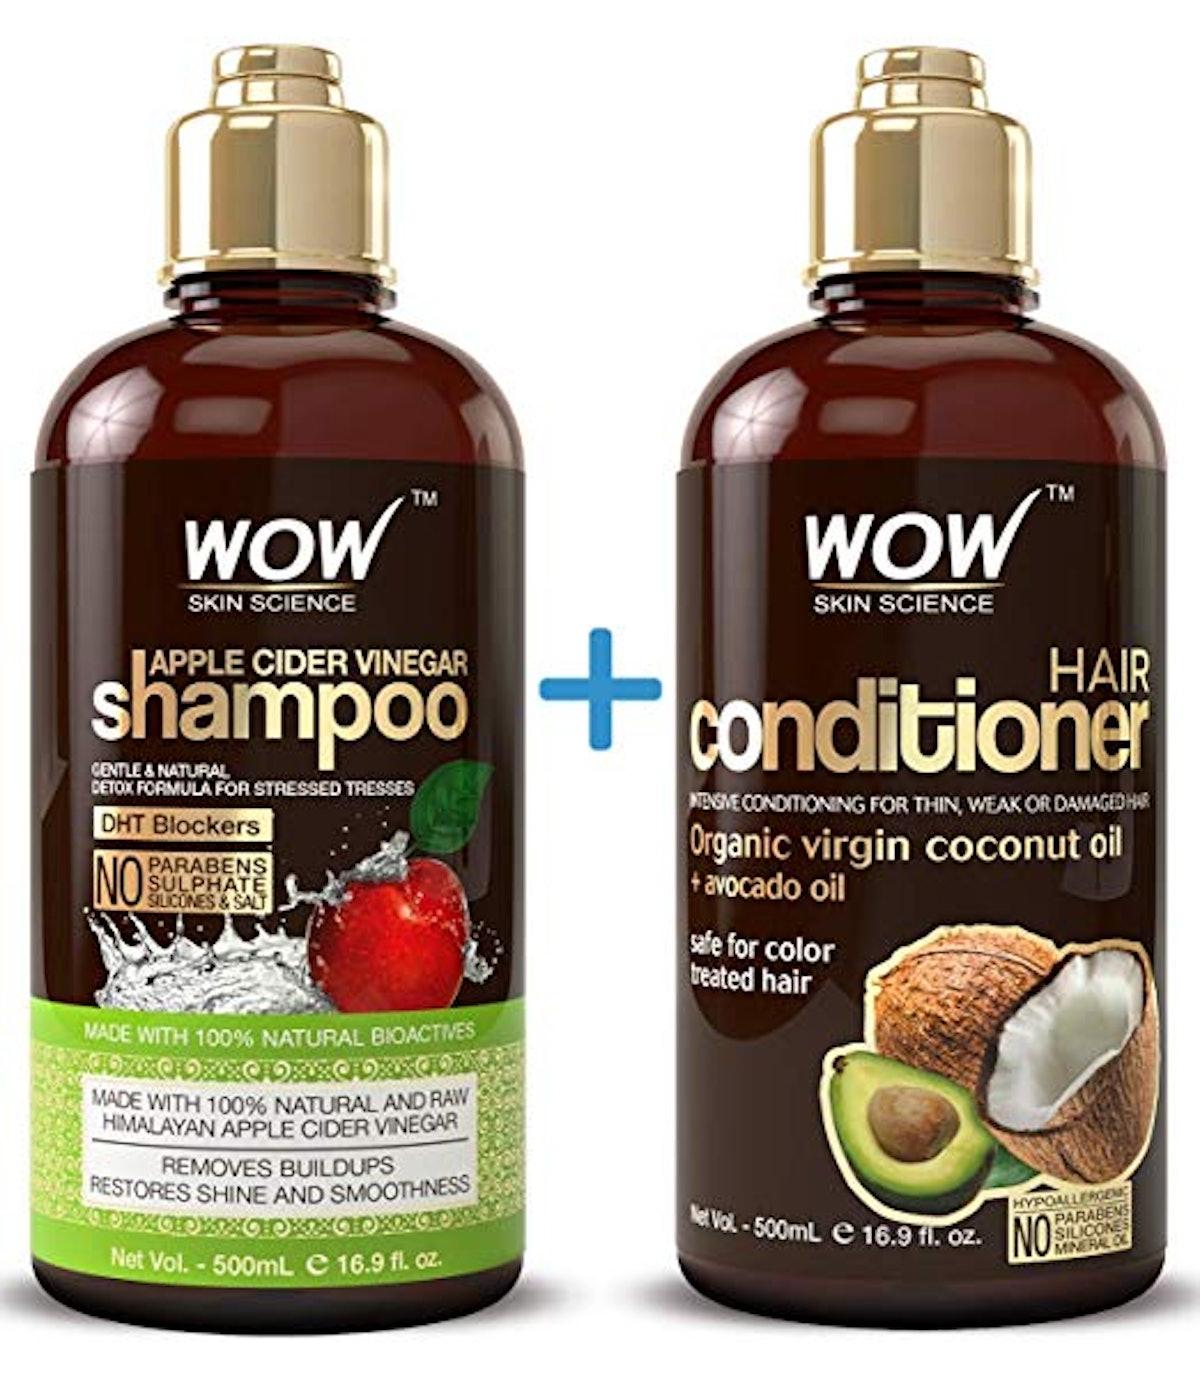 Buywow Apple Cider Vinegar Shampoo & Hair Conditioner Set